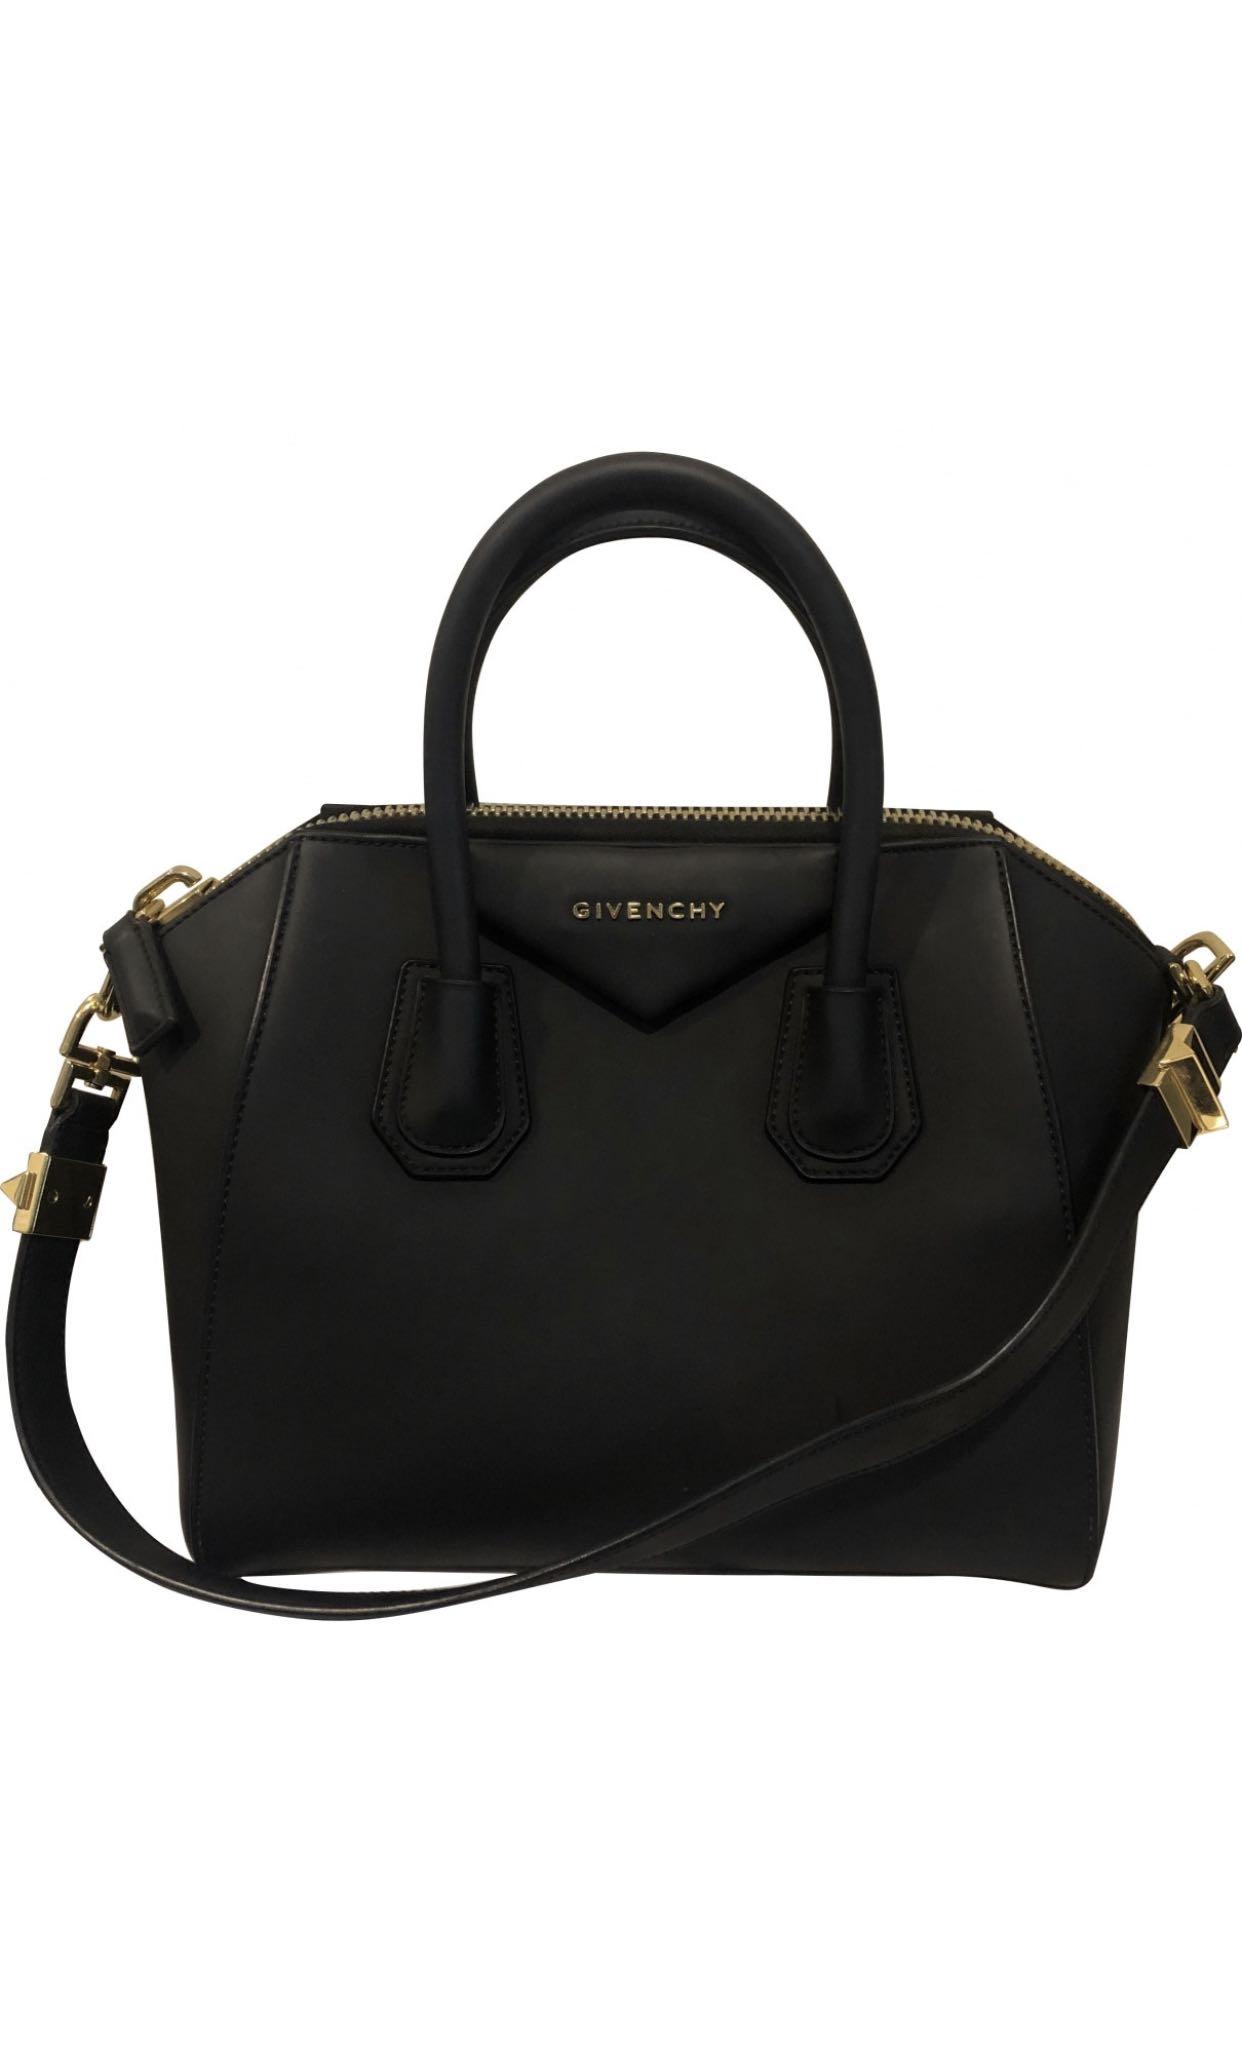 b8777c2d8b Home · Luxury · Bags   Wallets · Handbags. photo photo ...